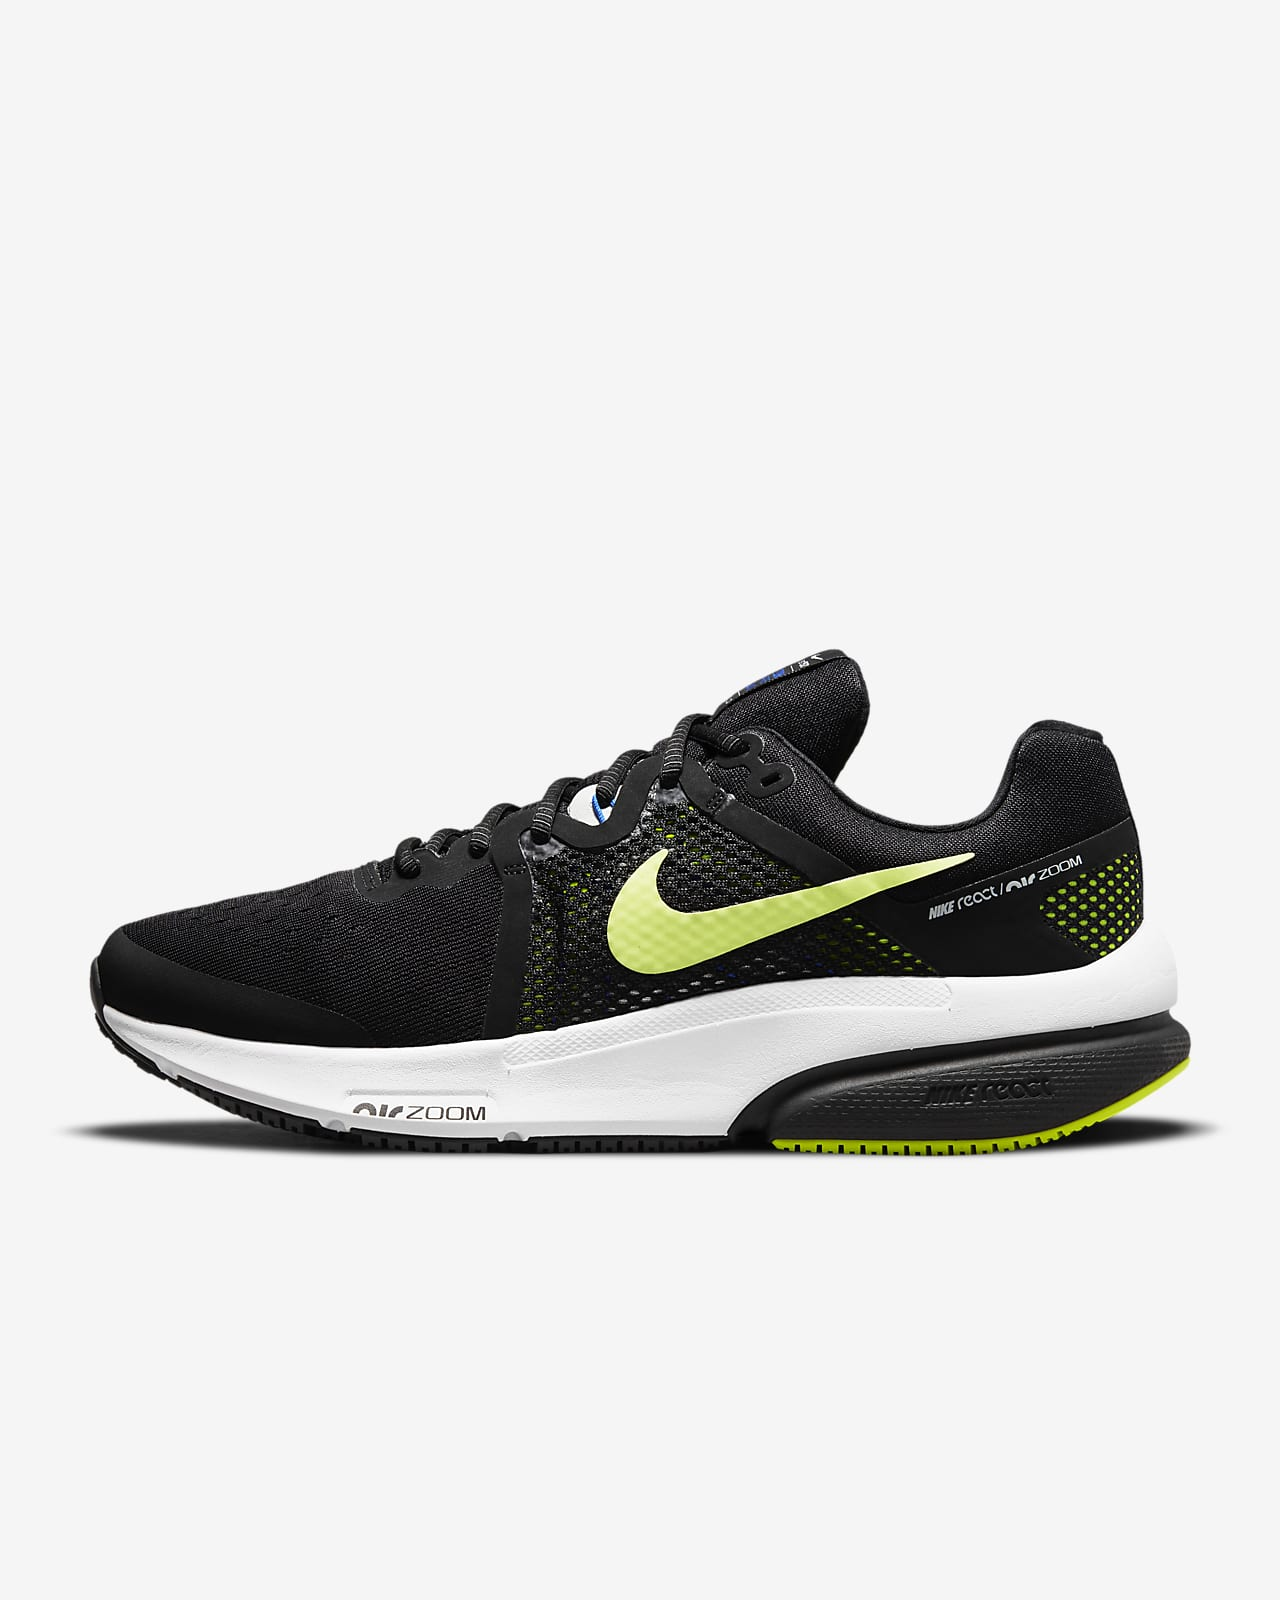 Nike Zoom Prevail Men's Road Running Shoe